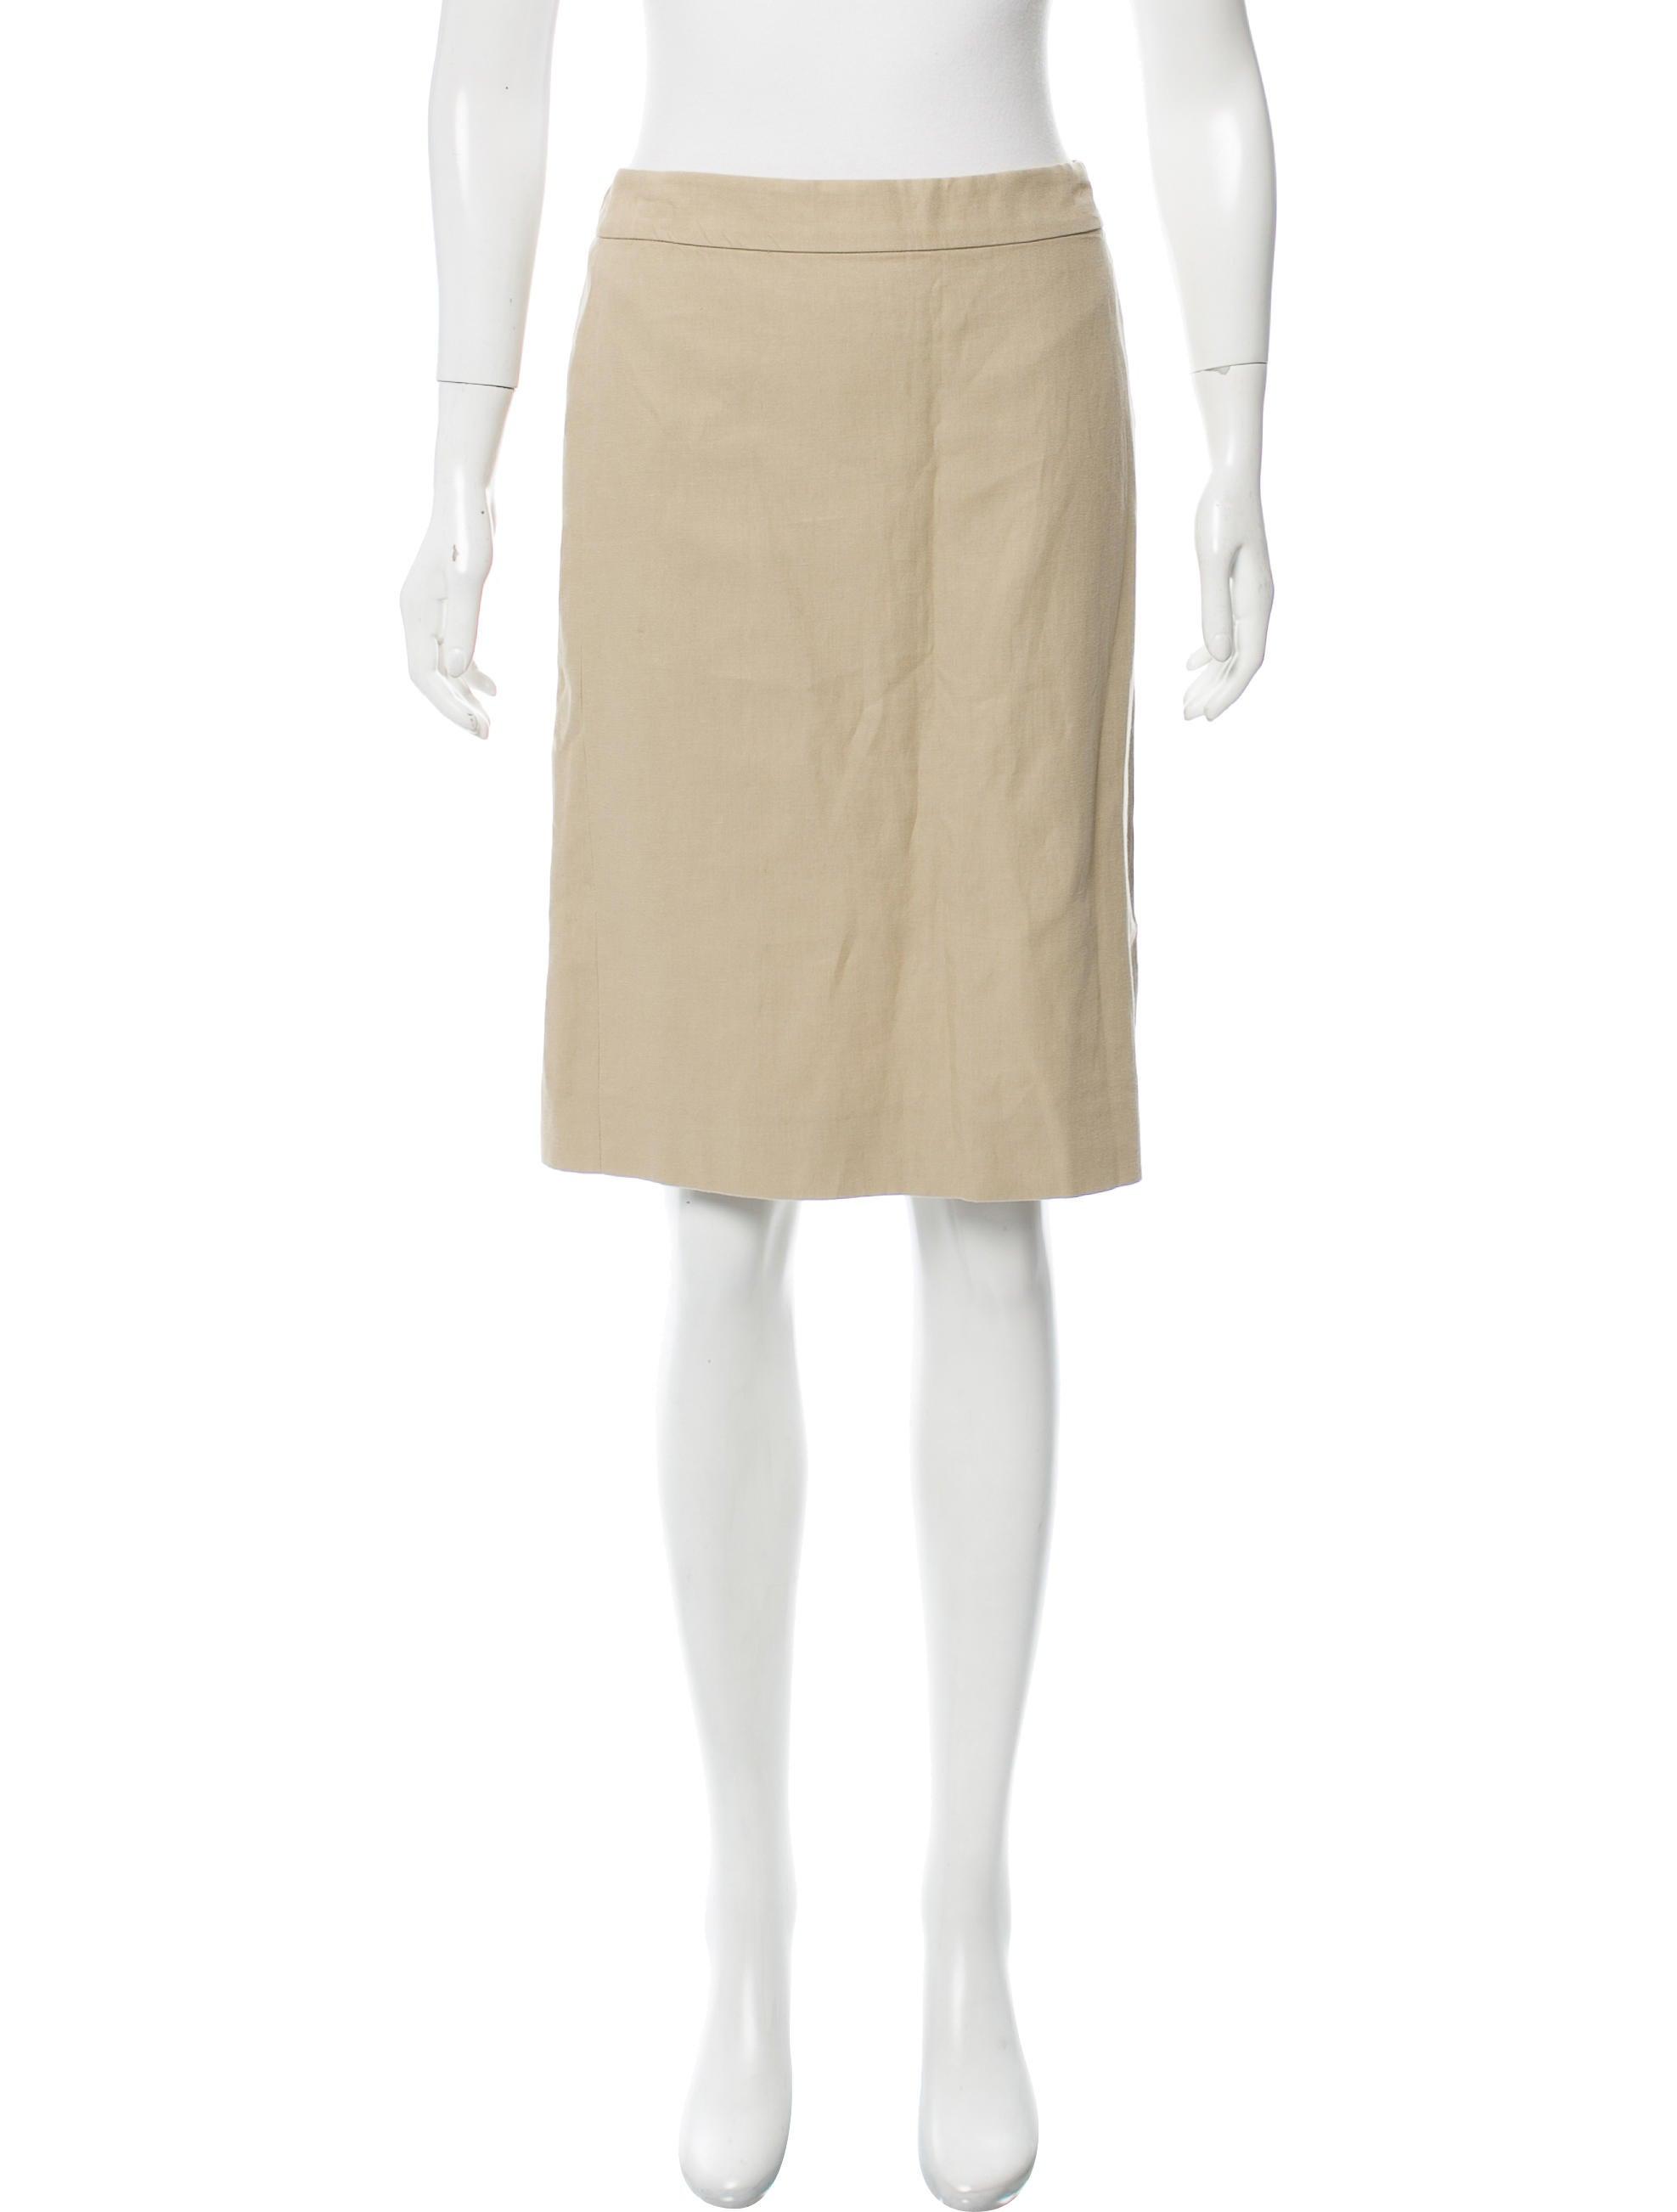 Moschino Knee-Length Pencil Skirt - Skirts